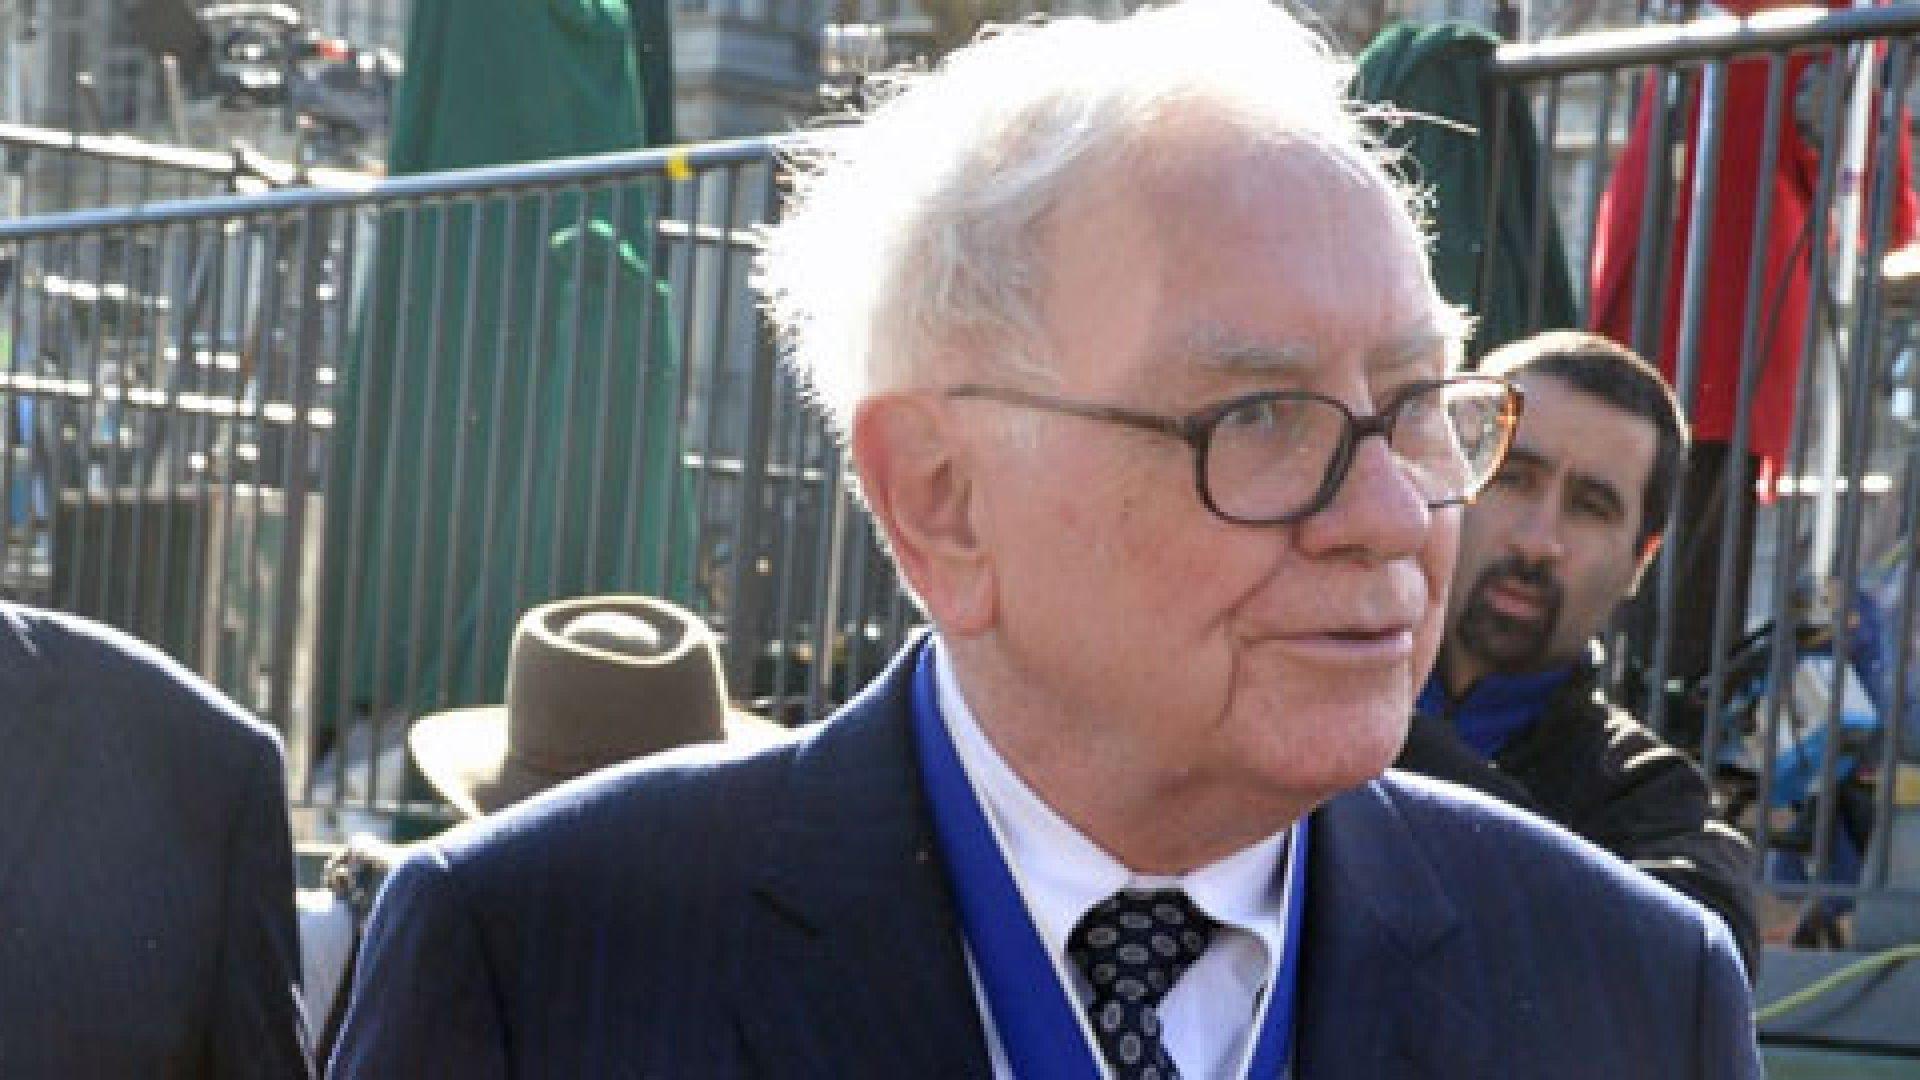 Buffett, Zuckerberg & the Meeting of Billionaires